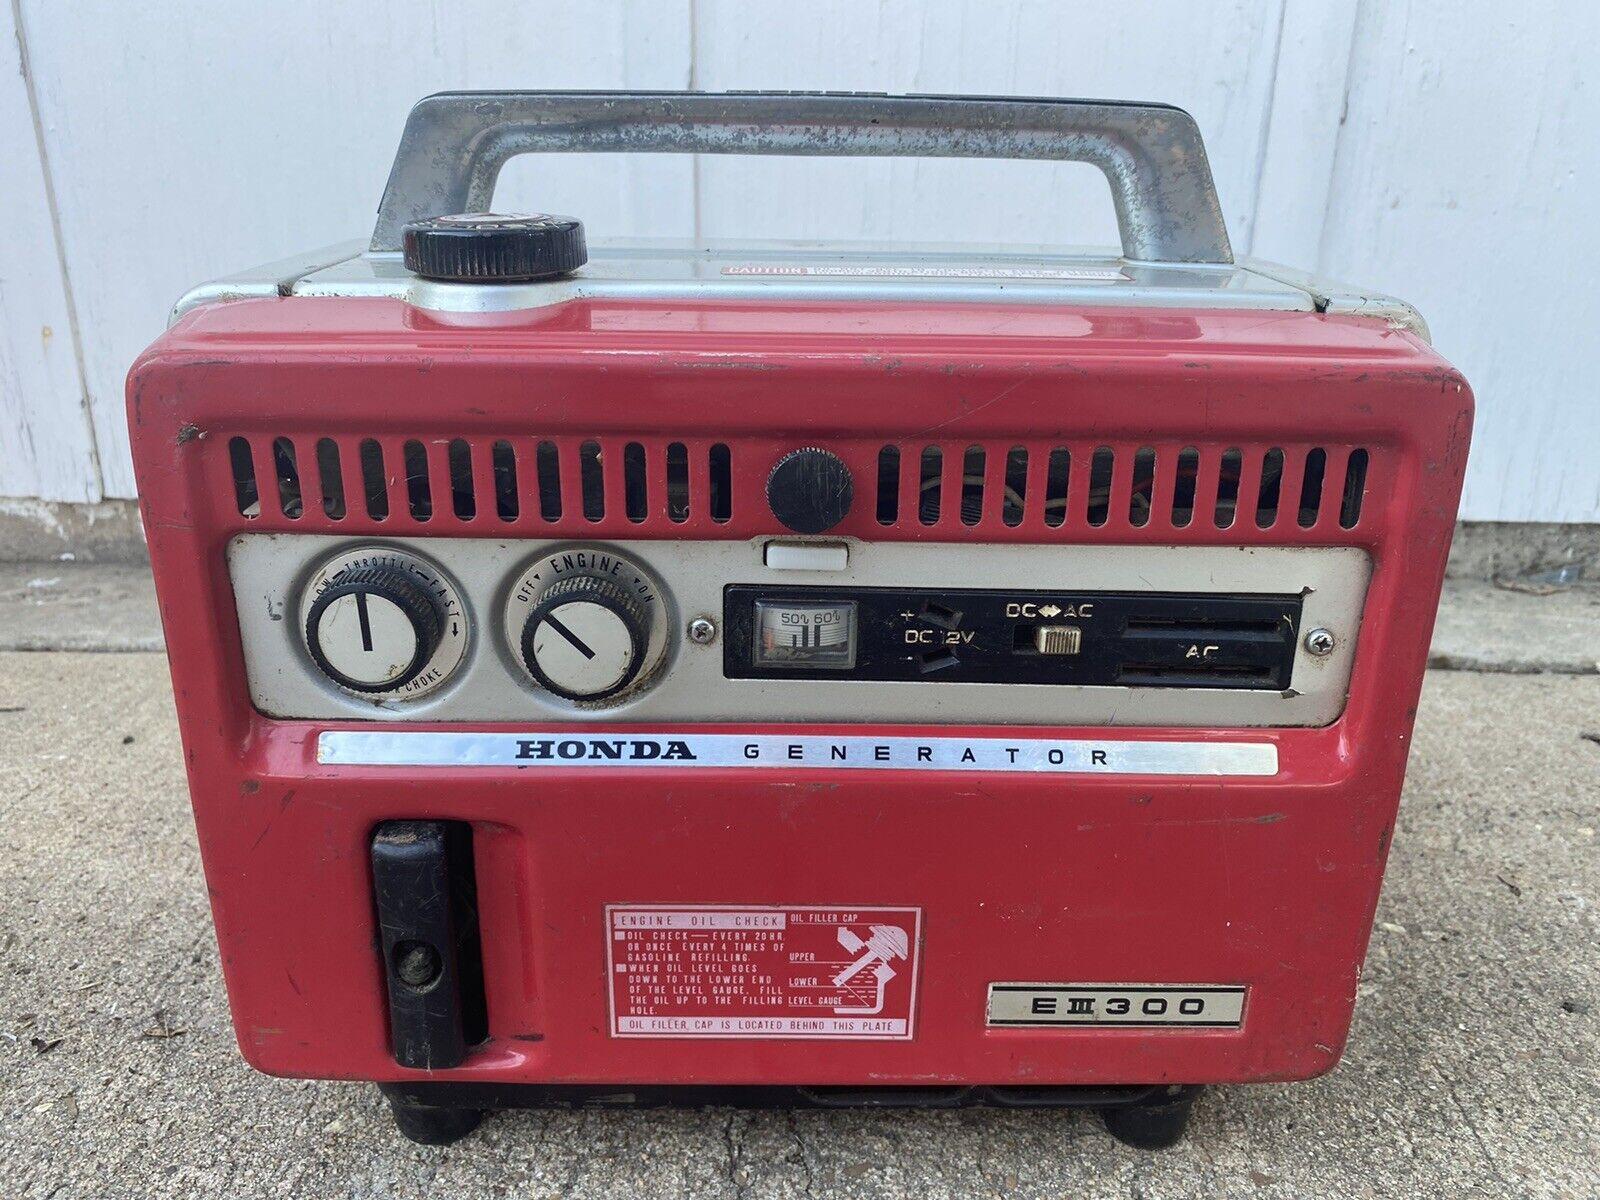 Honda Vintage E300 Portable Generator For Sale Online